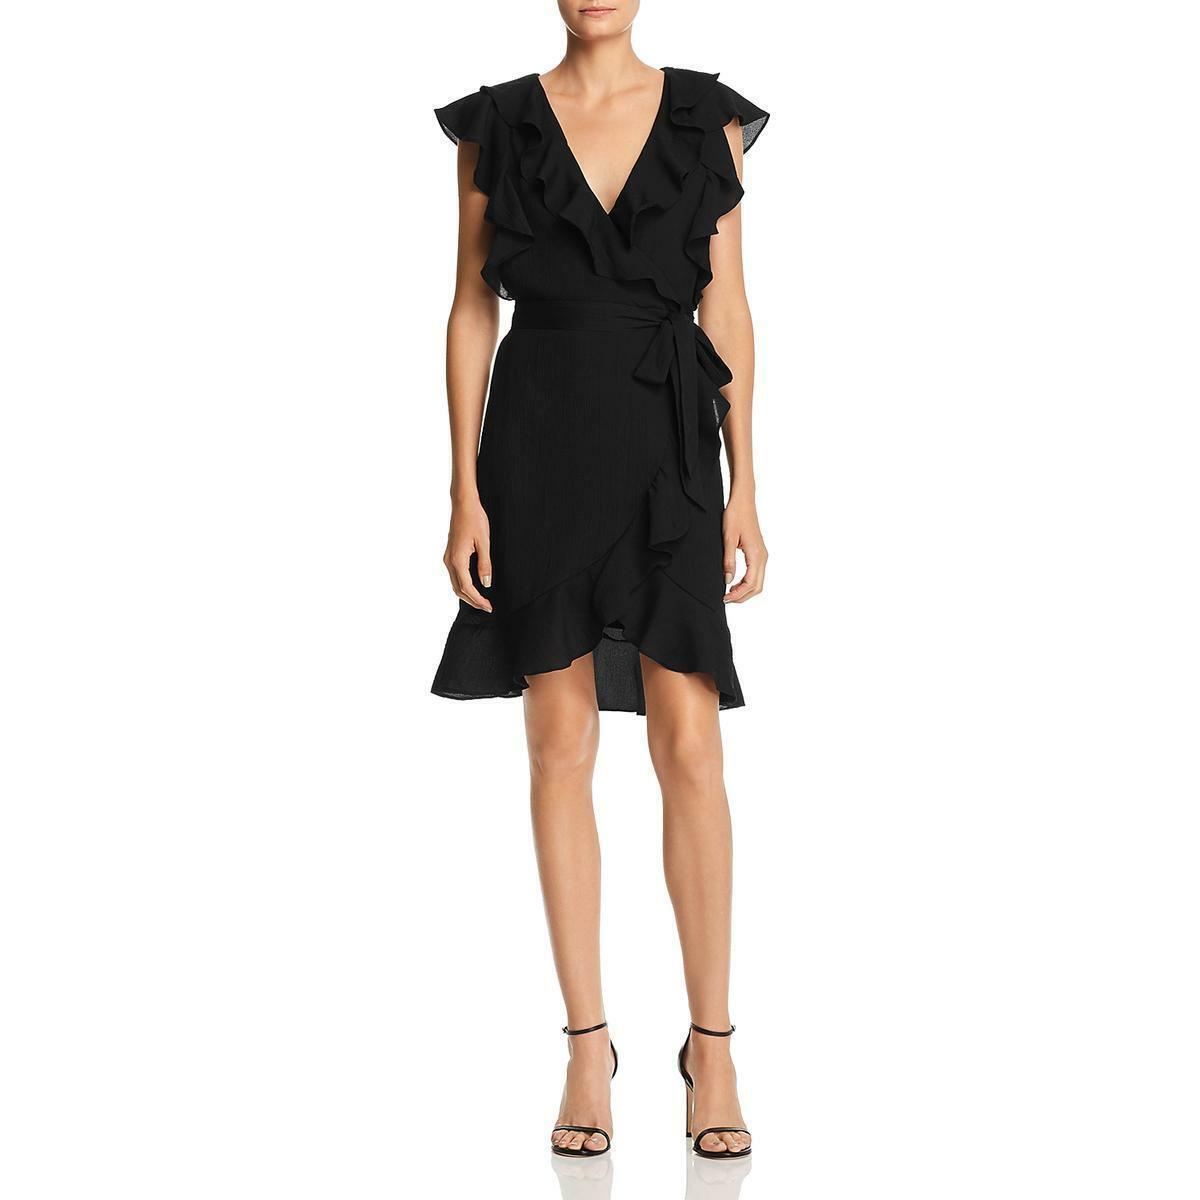 Ella Moss Womens Adara Black Floral Print Bell Sleeves Casual Dress XS BHFO 0220